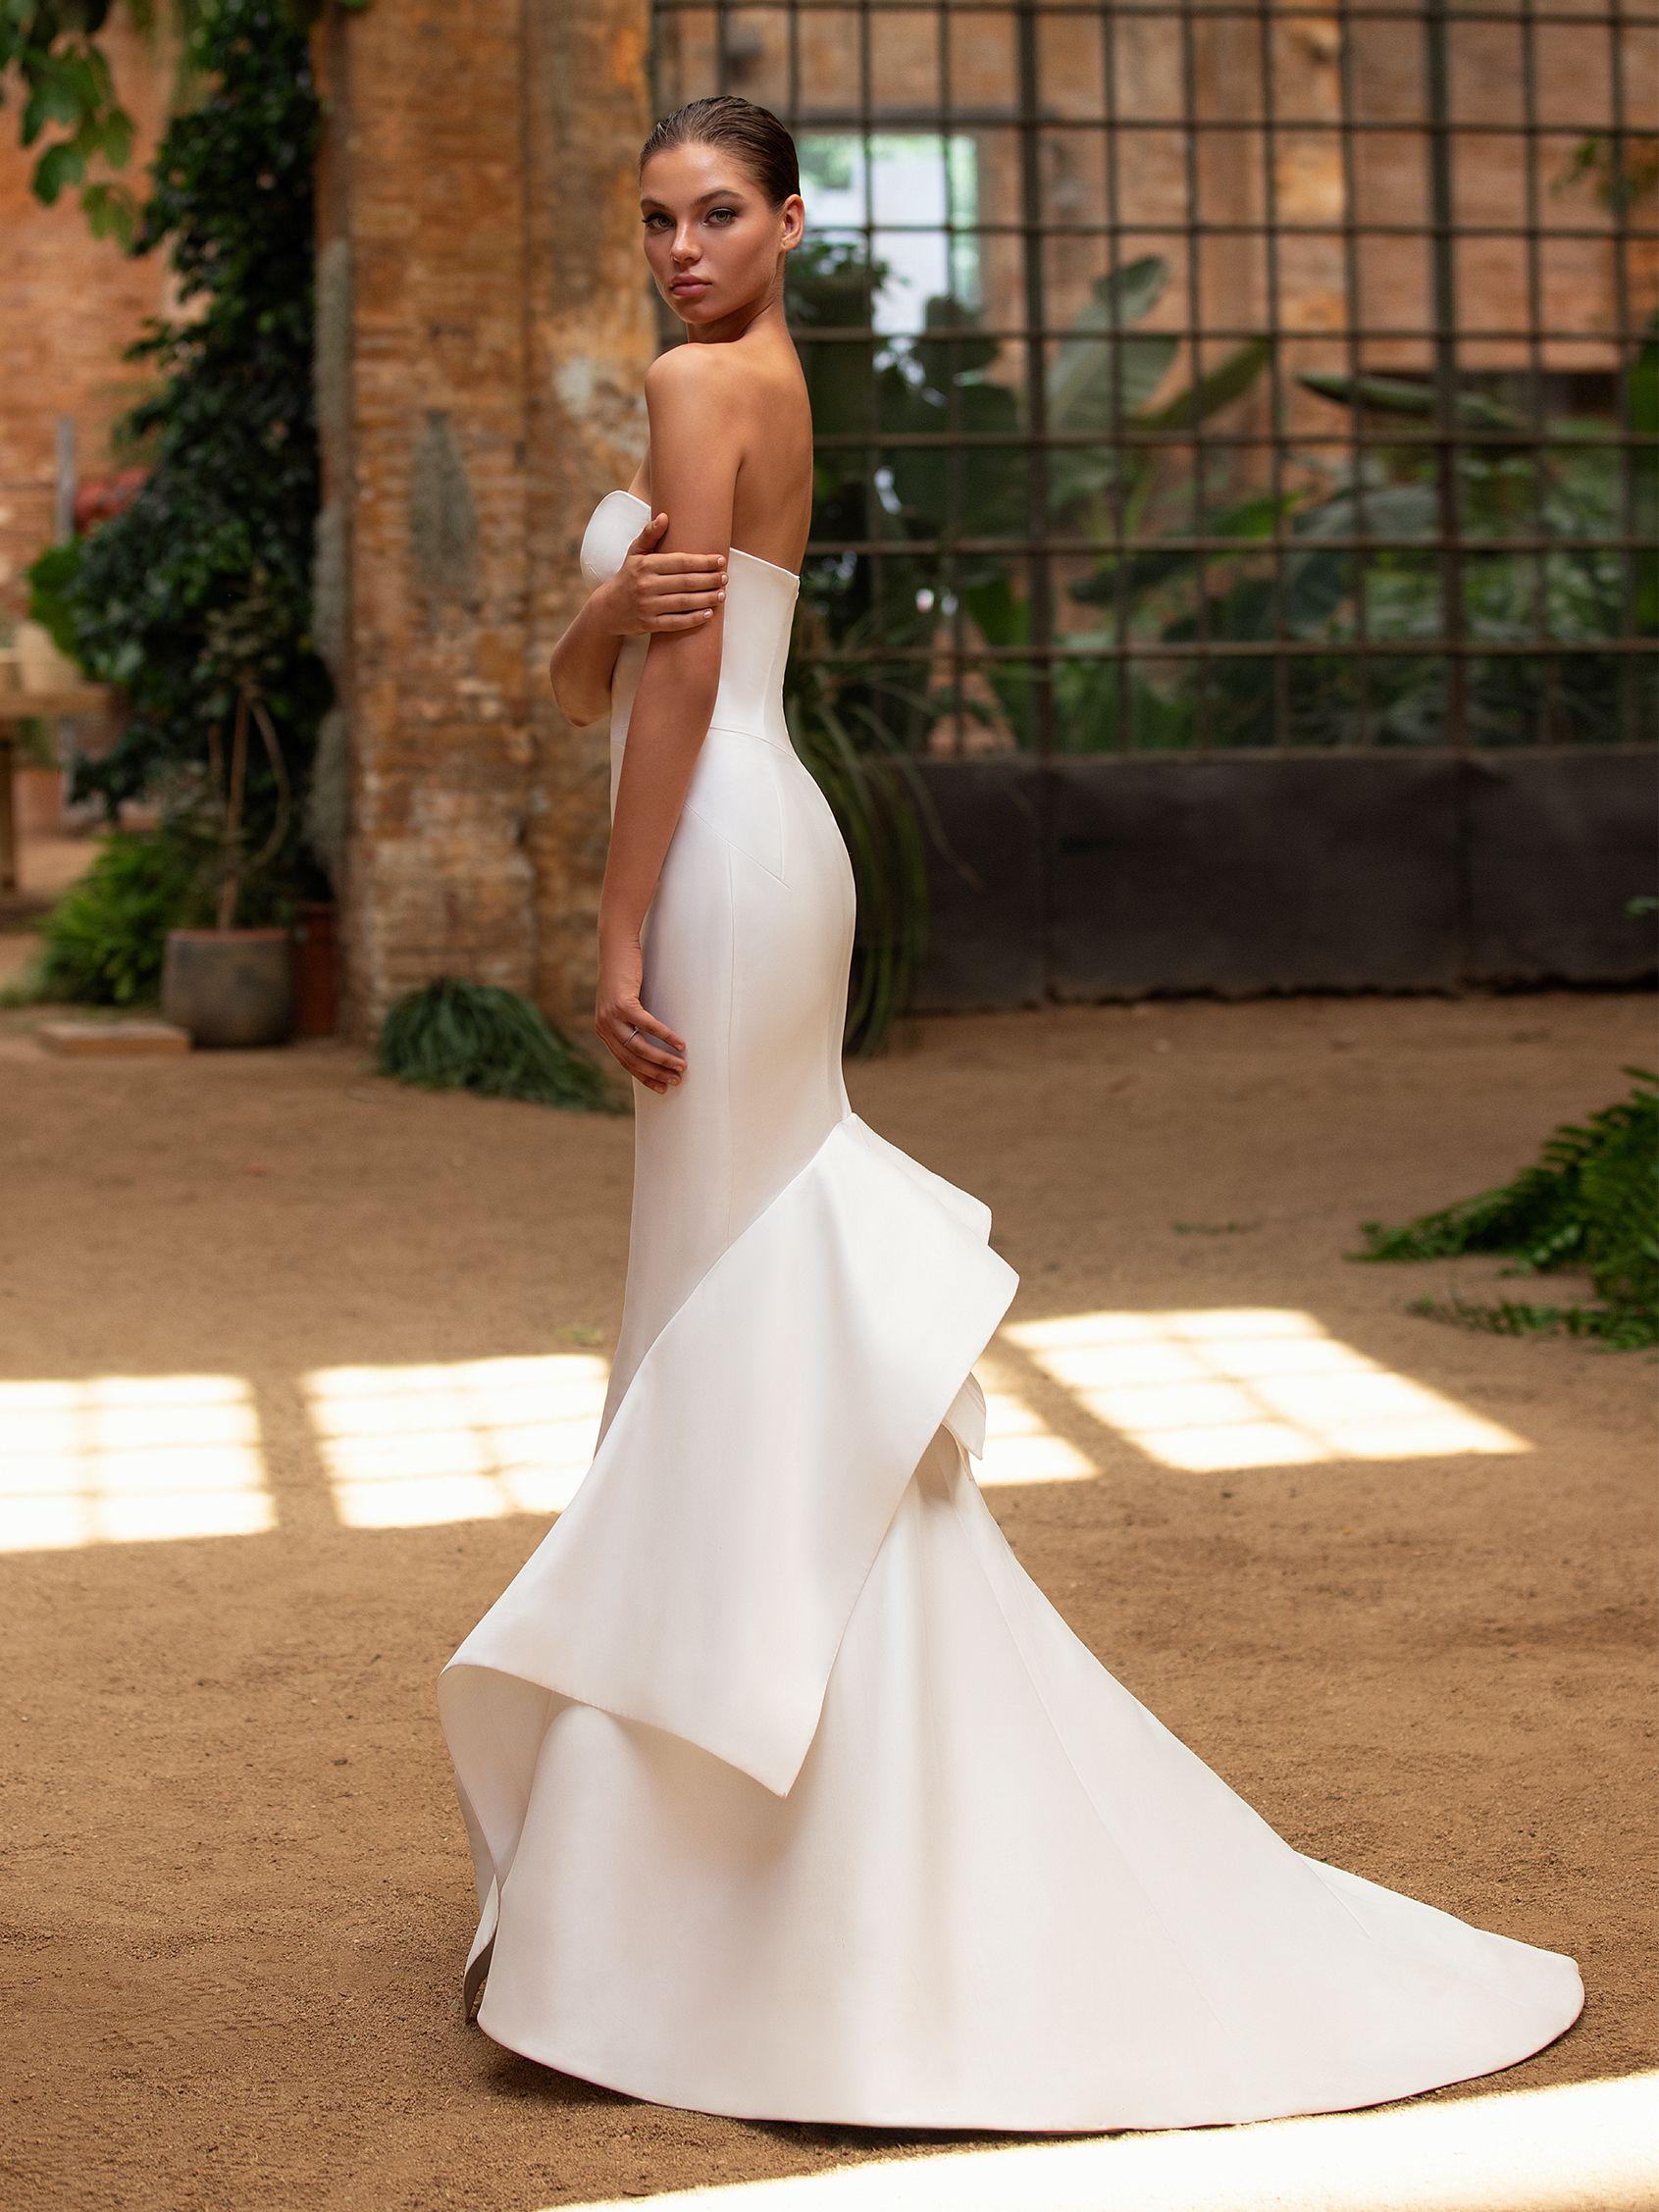 Katie Dress Wedding Dresses Sweetheart Neckline Bridal Wedding Dress Trends [ jpg ]